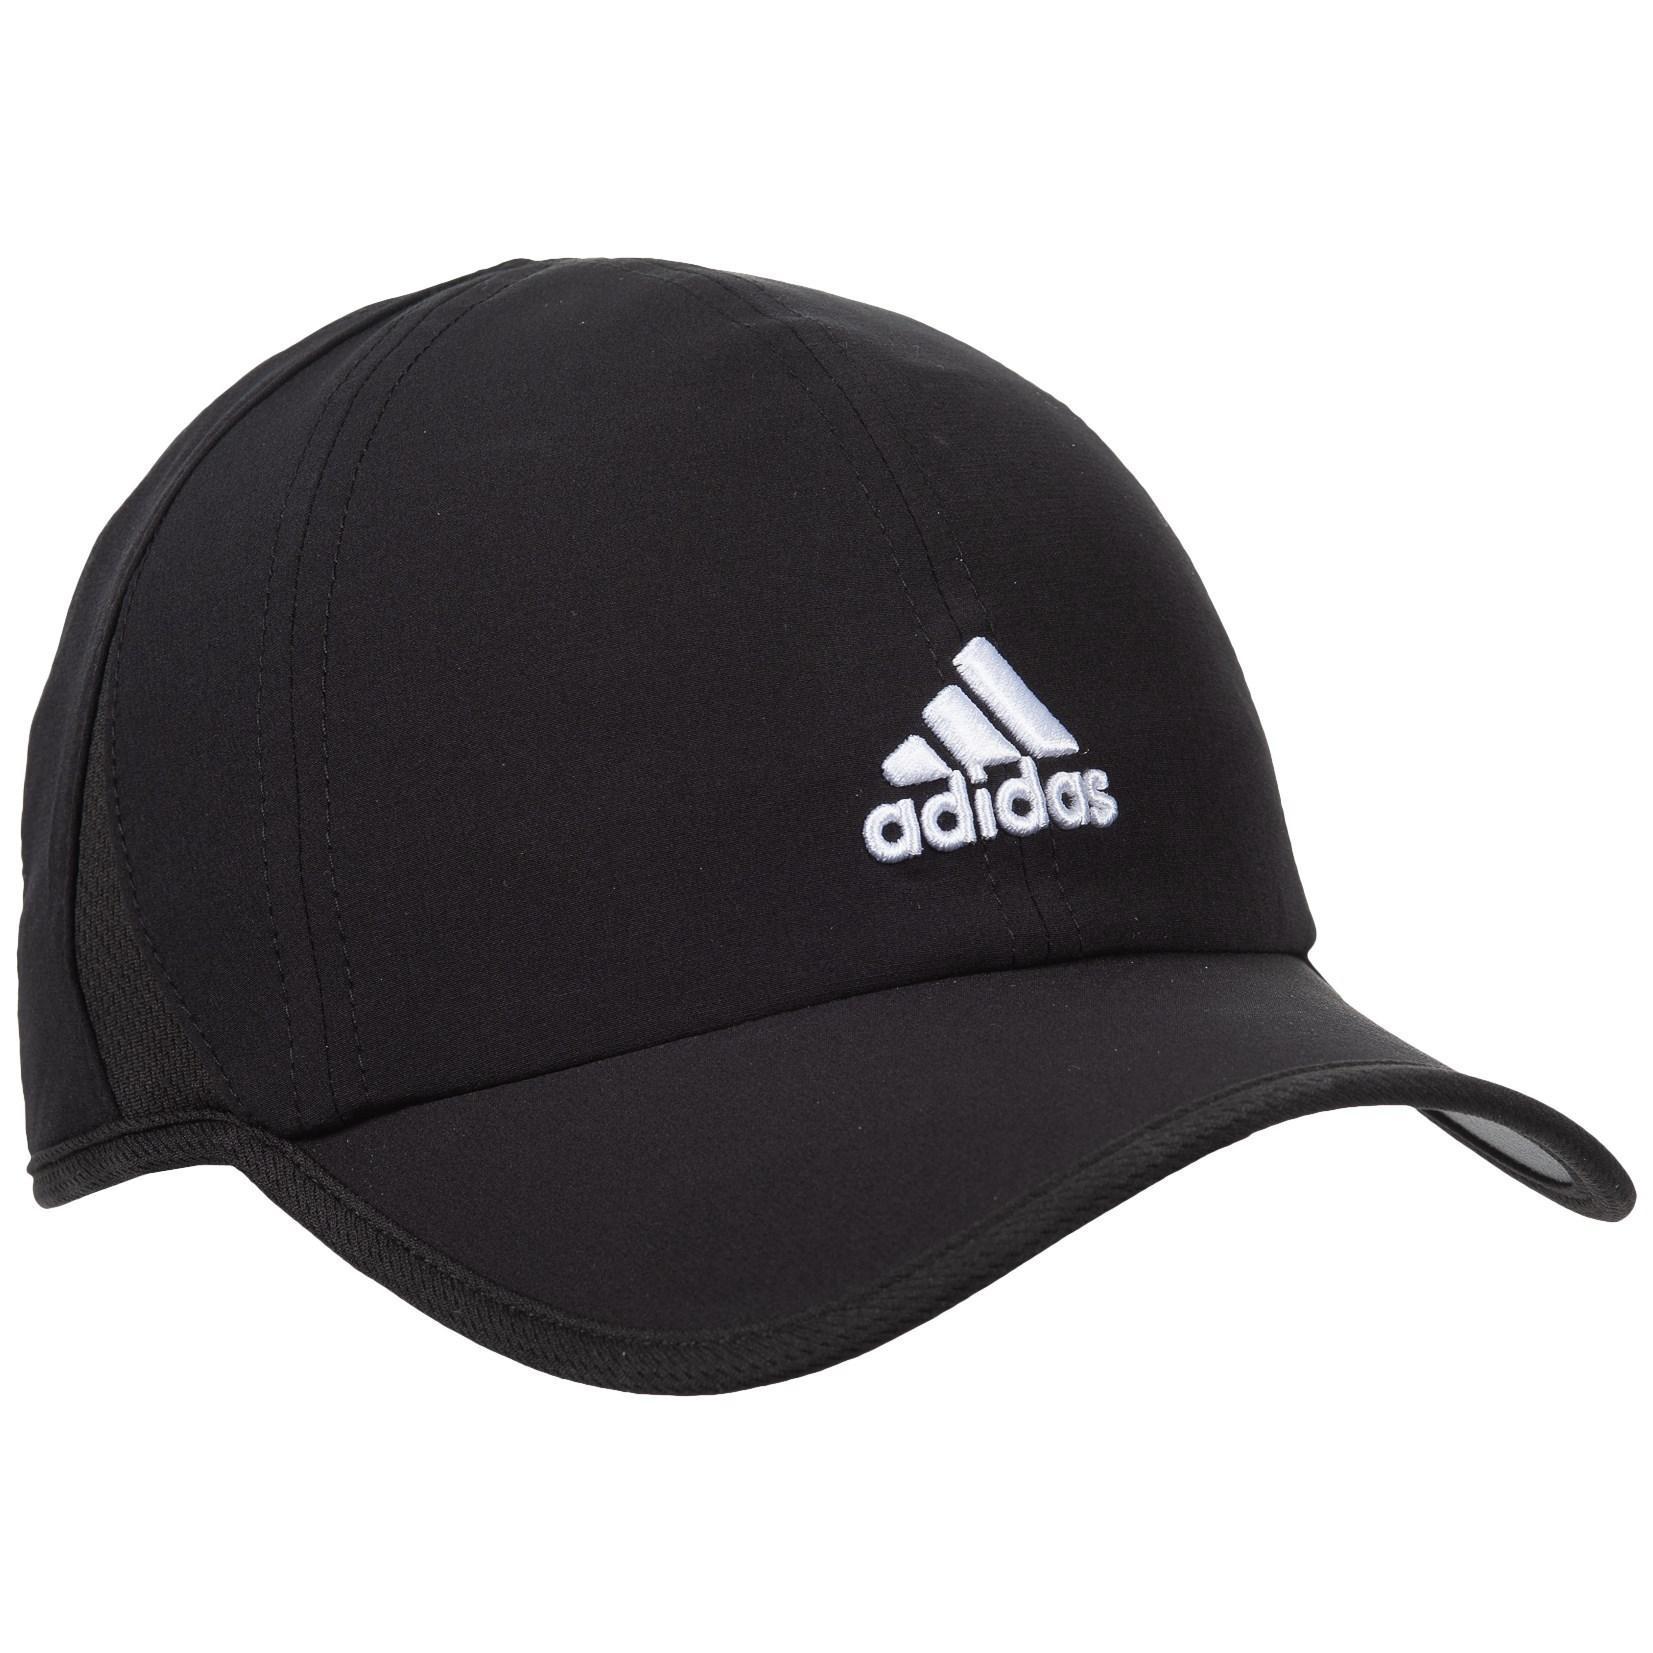 Adidas - Black Adizero Ii Baseball Cap for Men - Lyst. View fullscreen cd23f541ba9